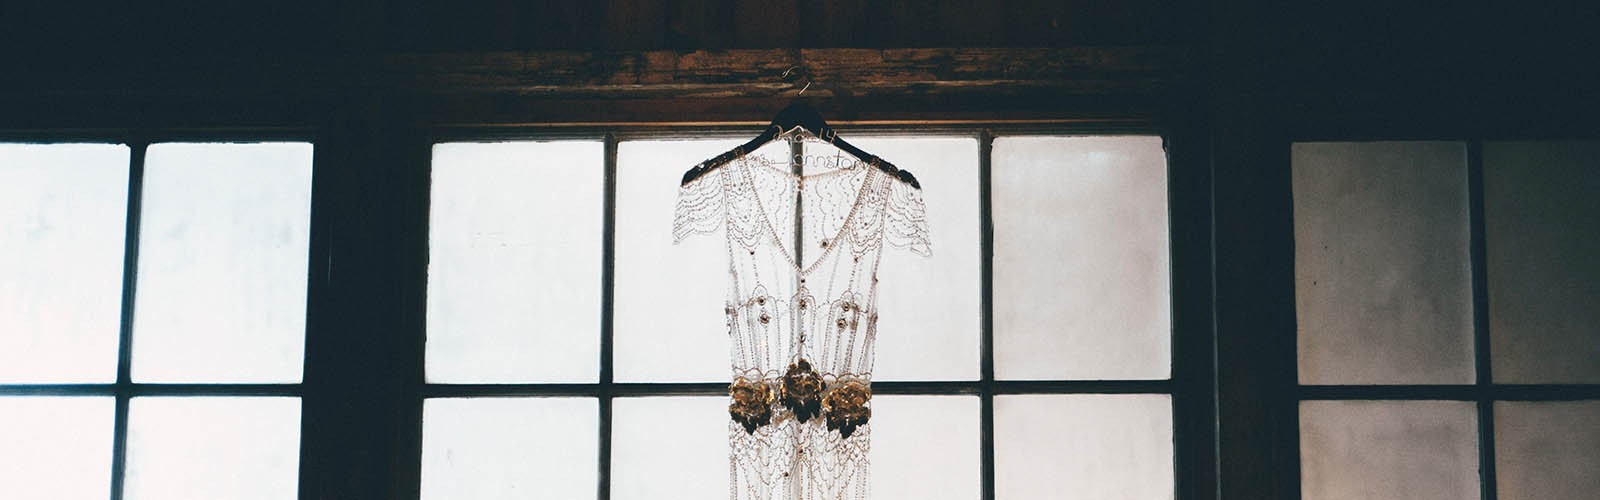 Zora & Jerome | Portland Wedding Photographer